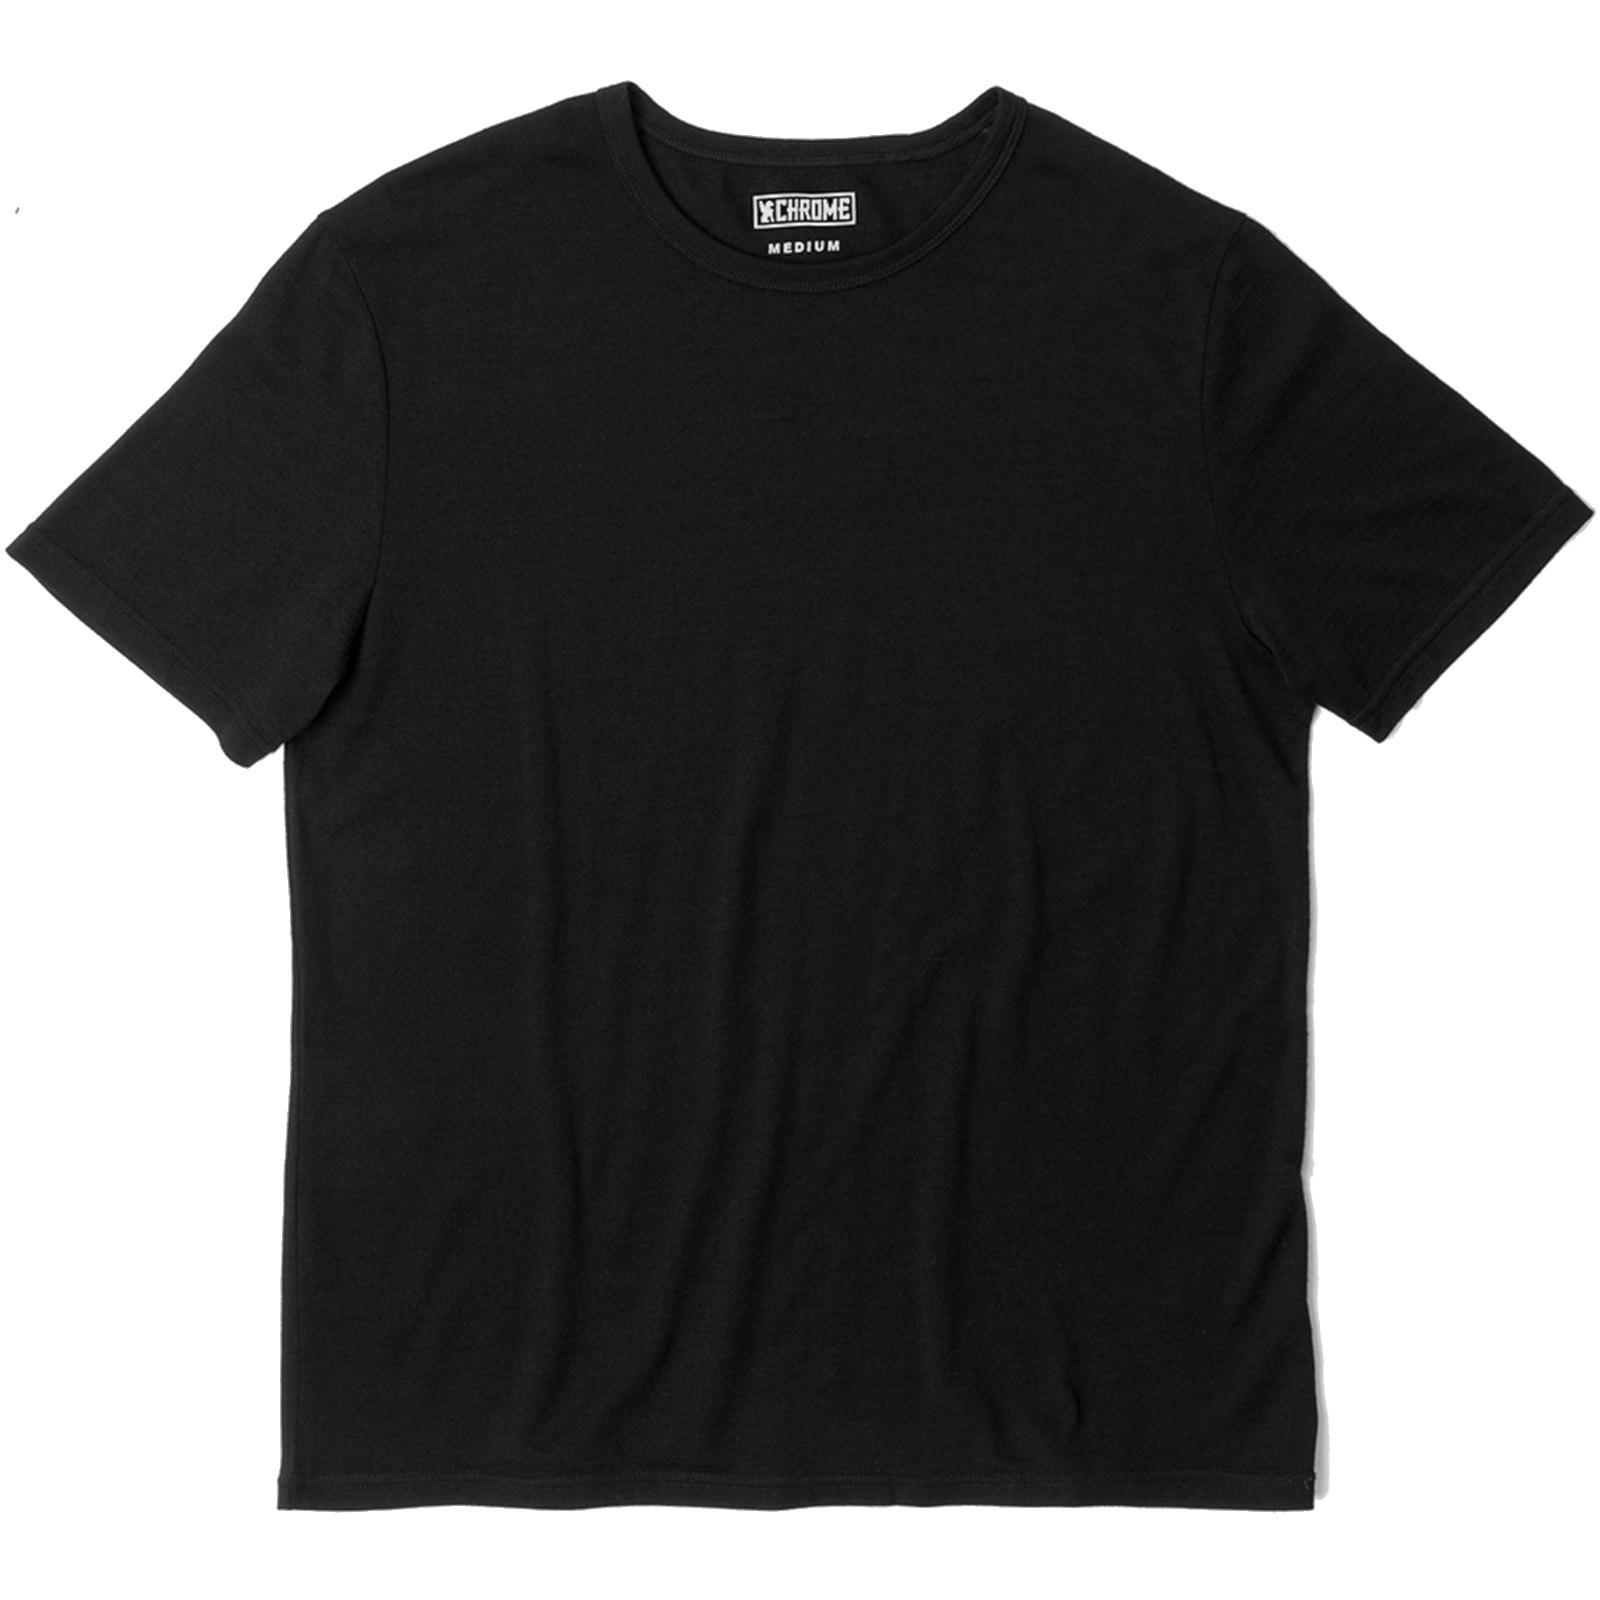 CHROME Merino Short Sleeve Tee - Black